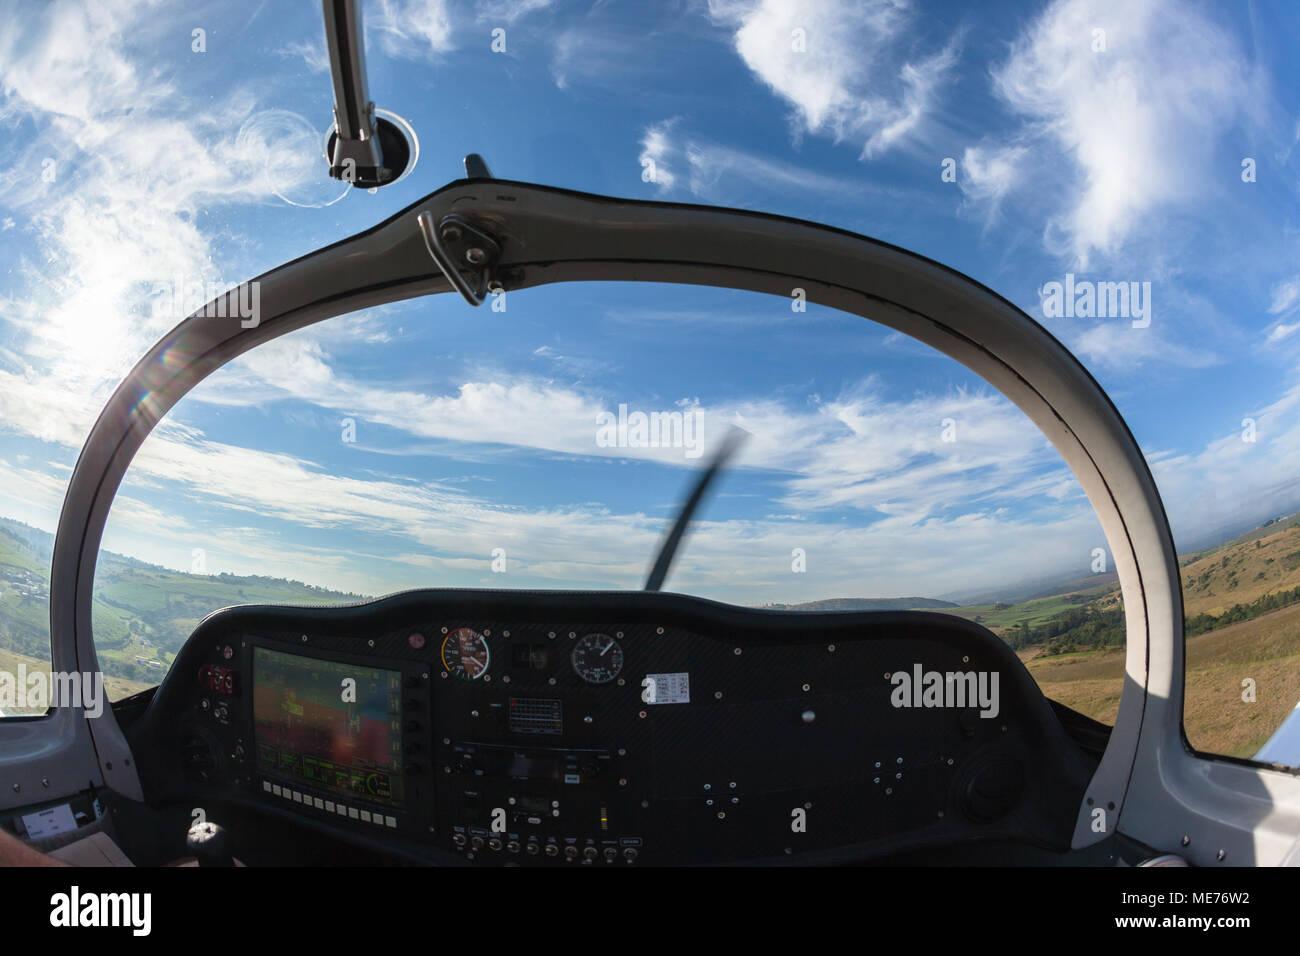 small single prop engine aircraft plane pilot inside out cockpit